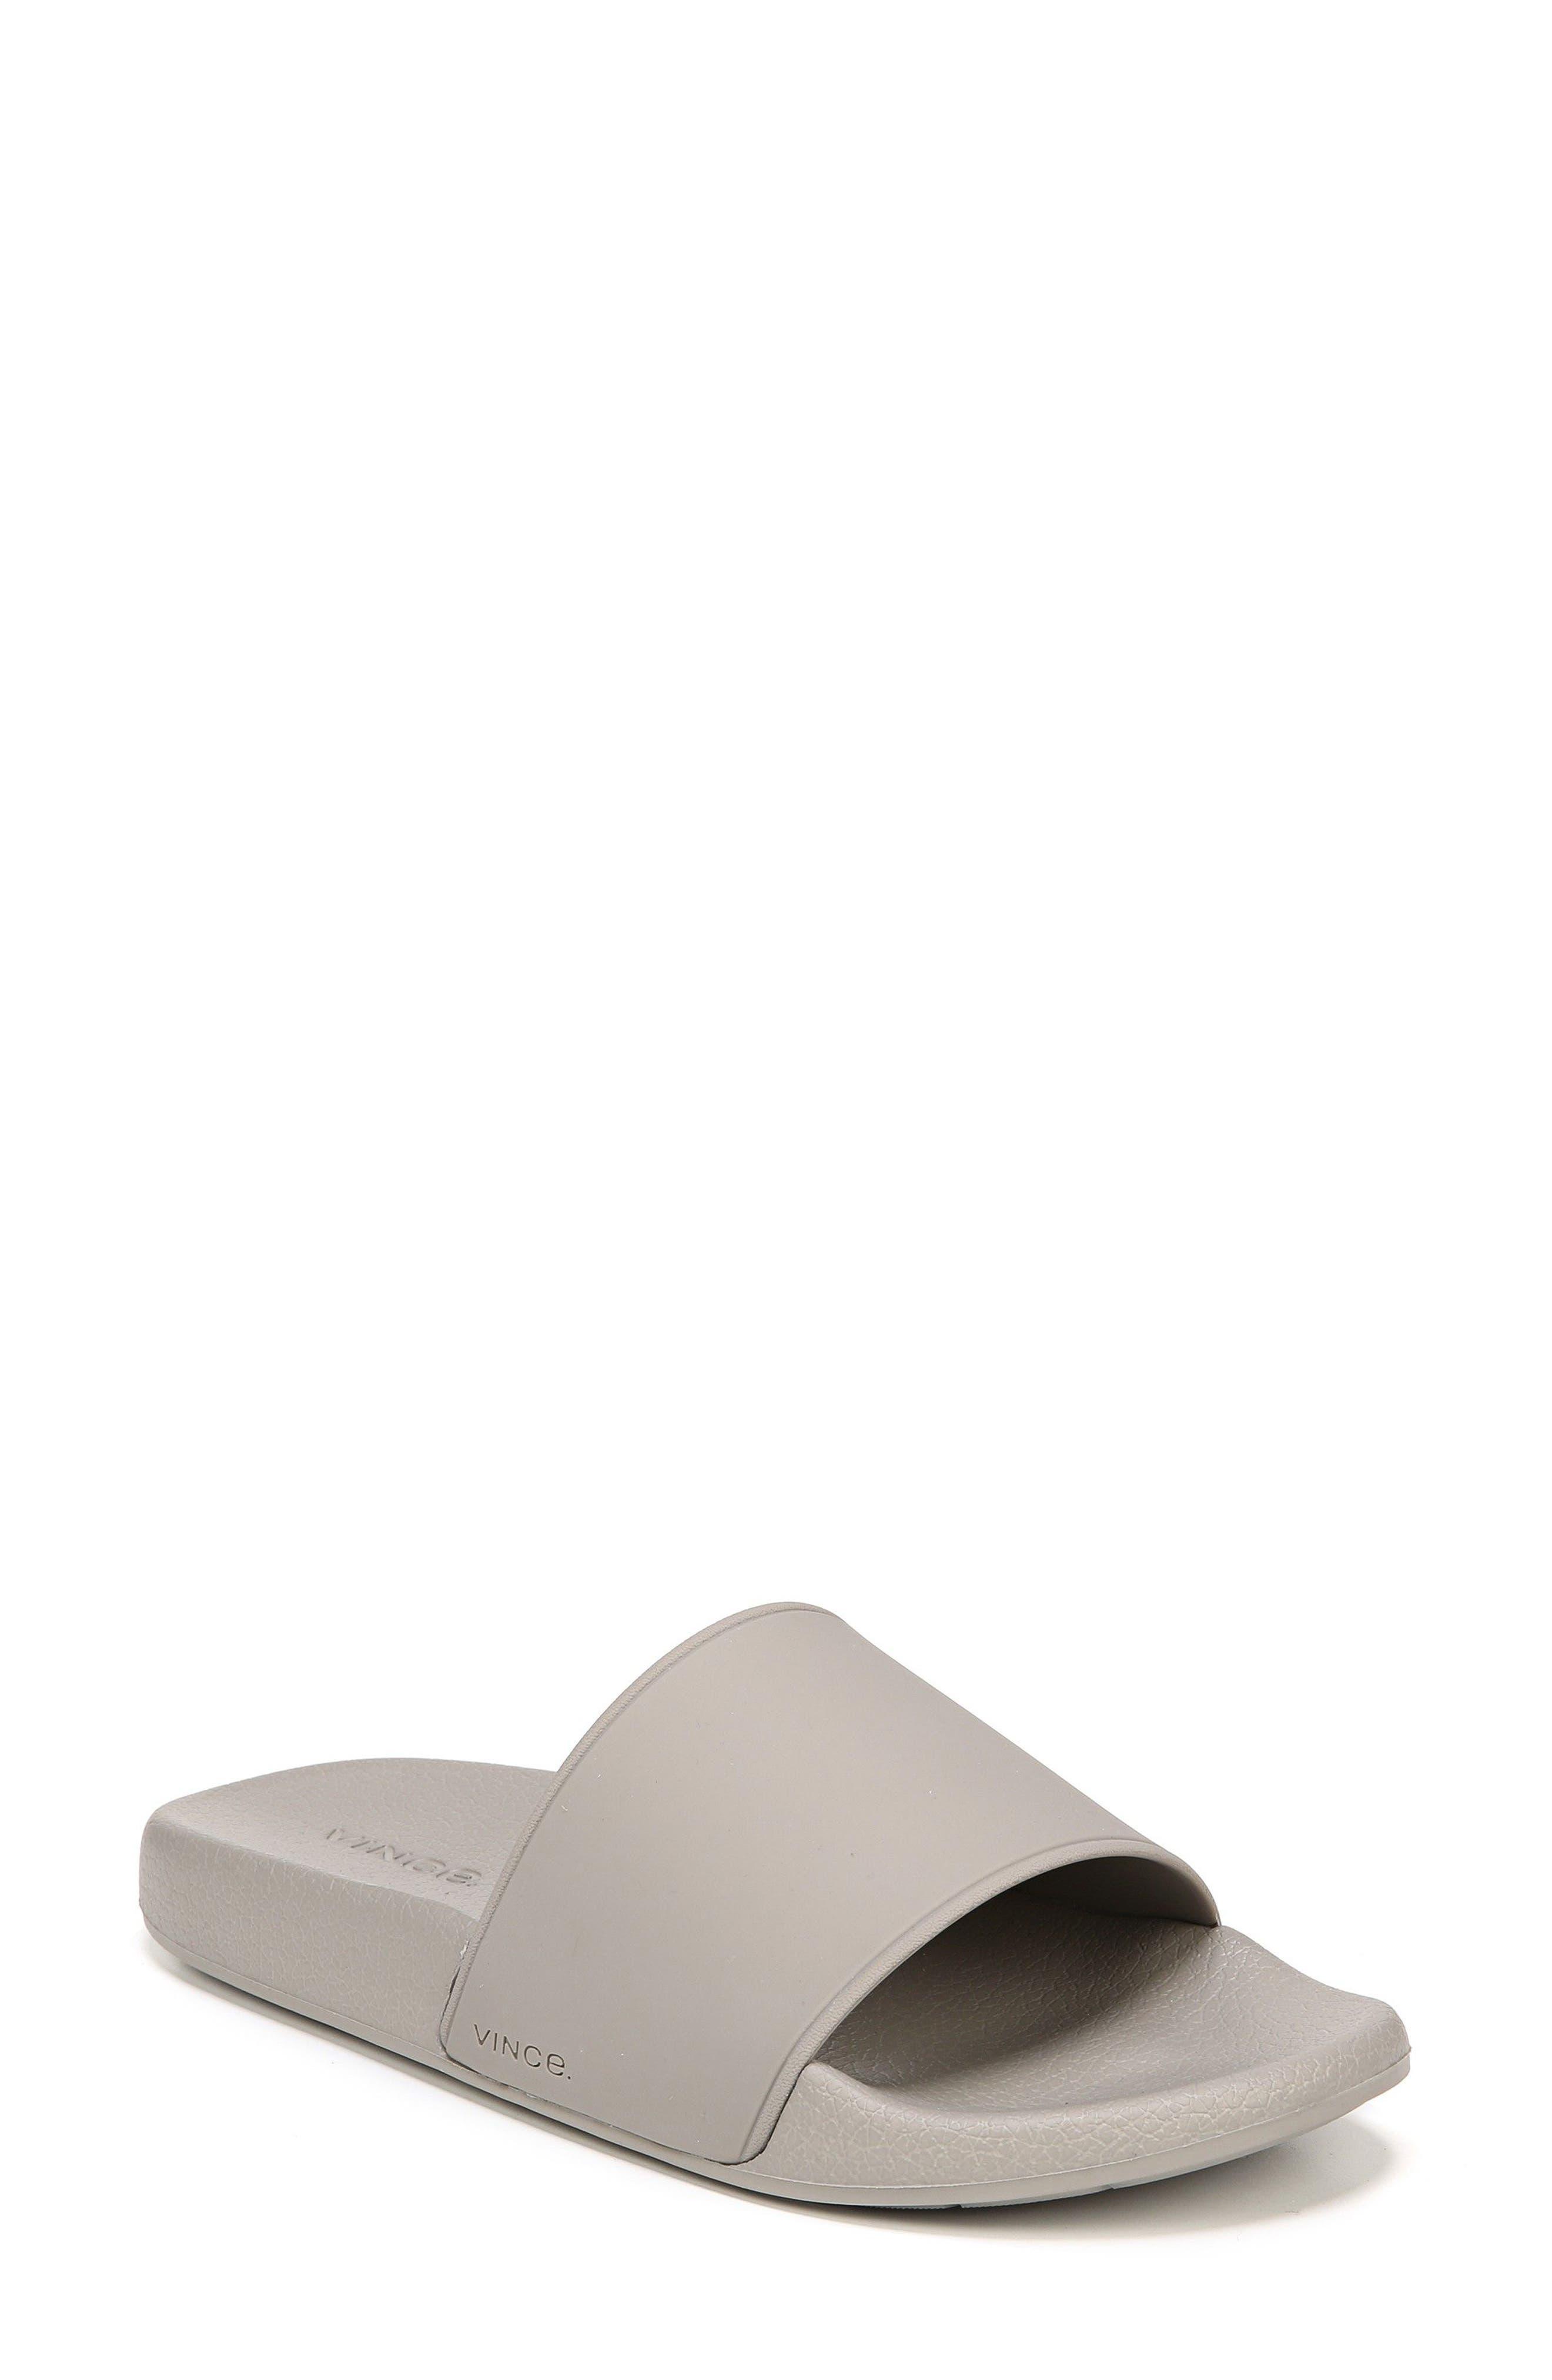 Main Image - Vince Westcoast Slide Sandal (Women)